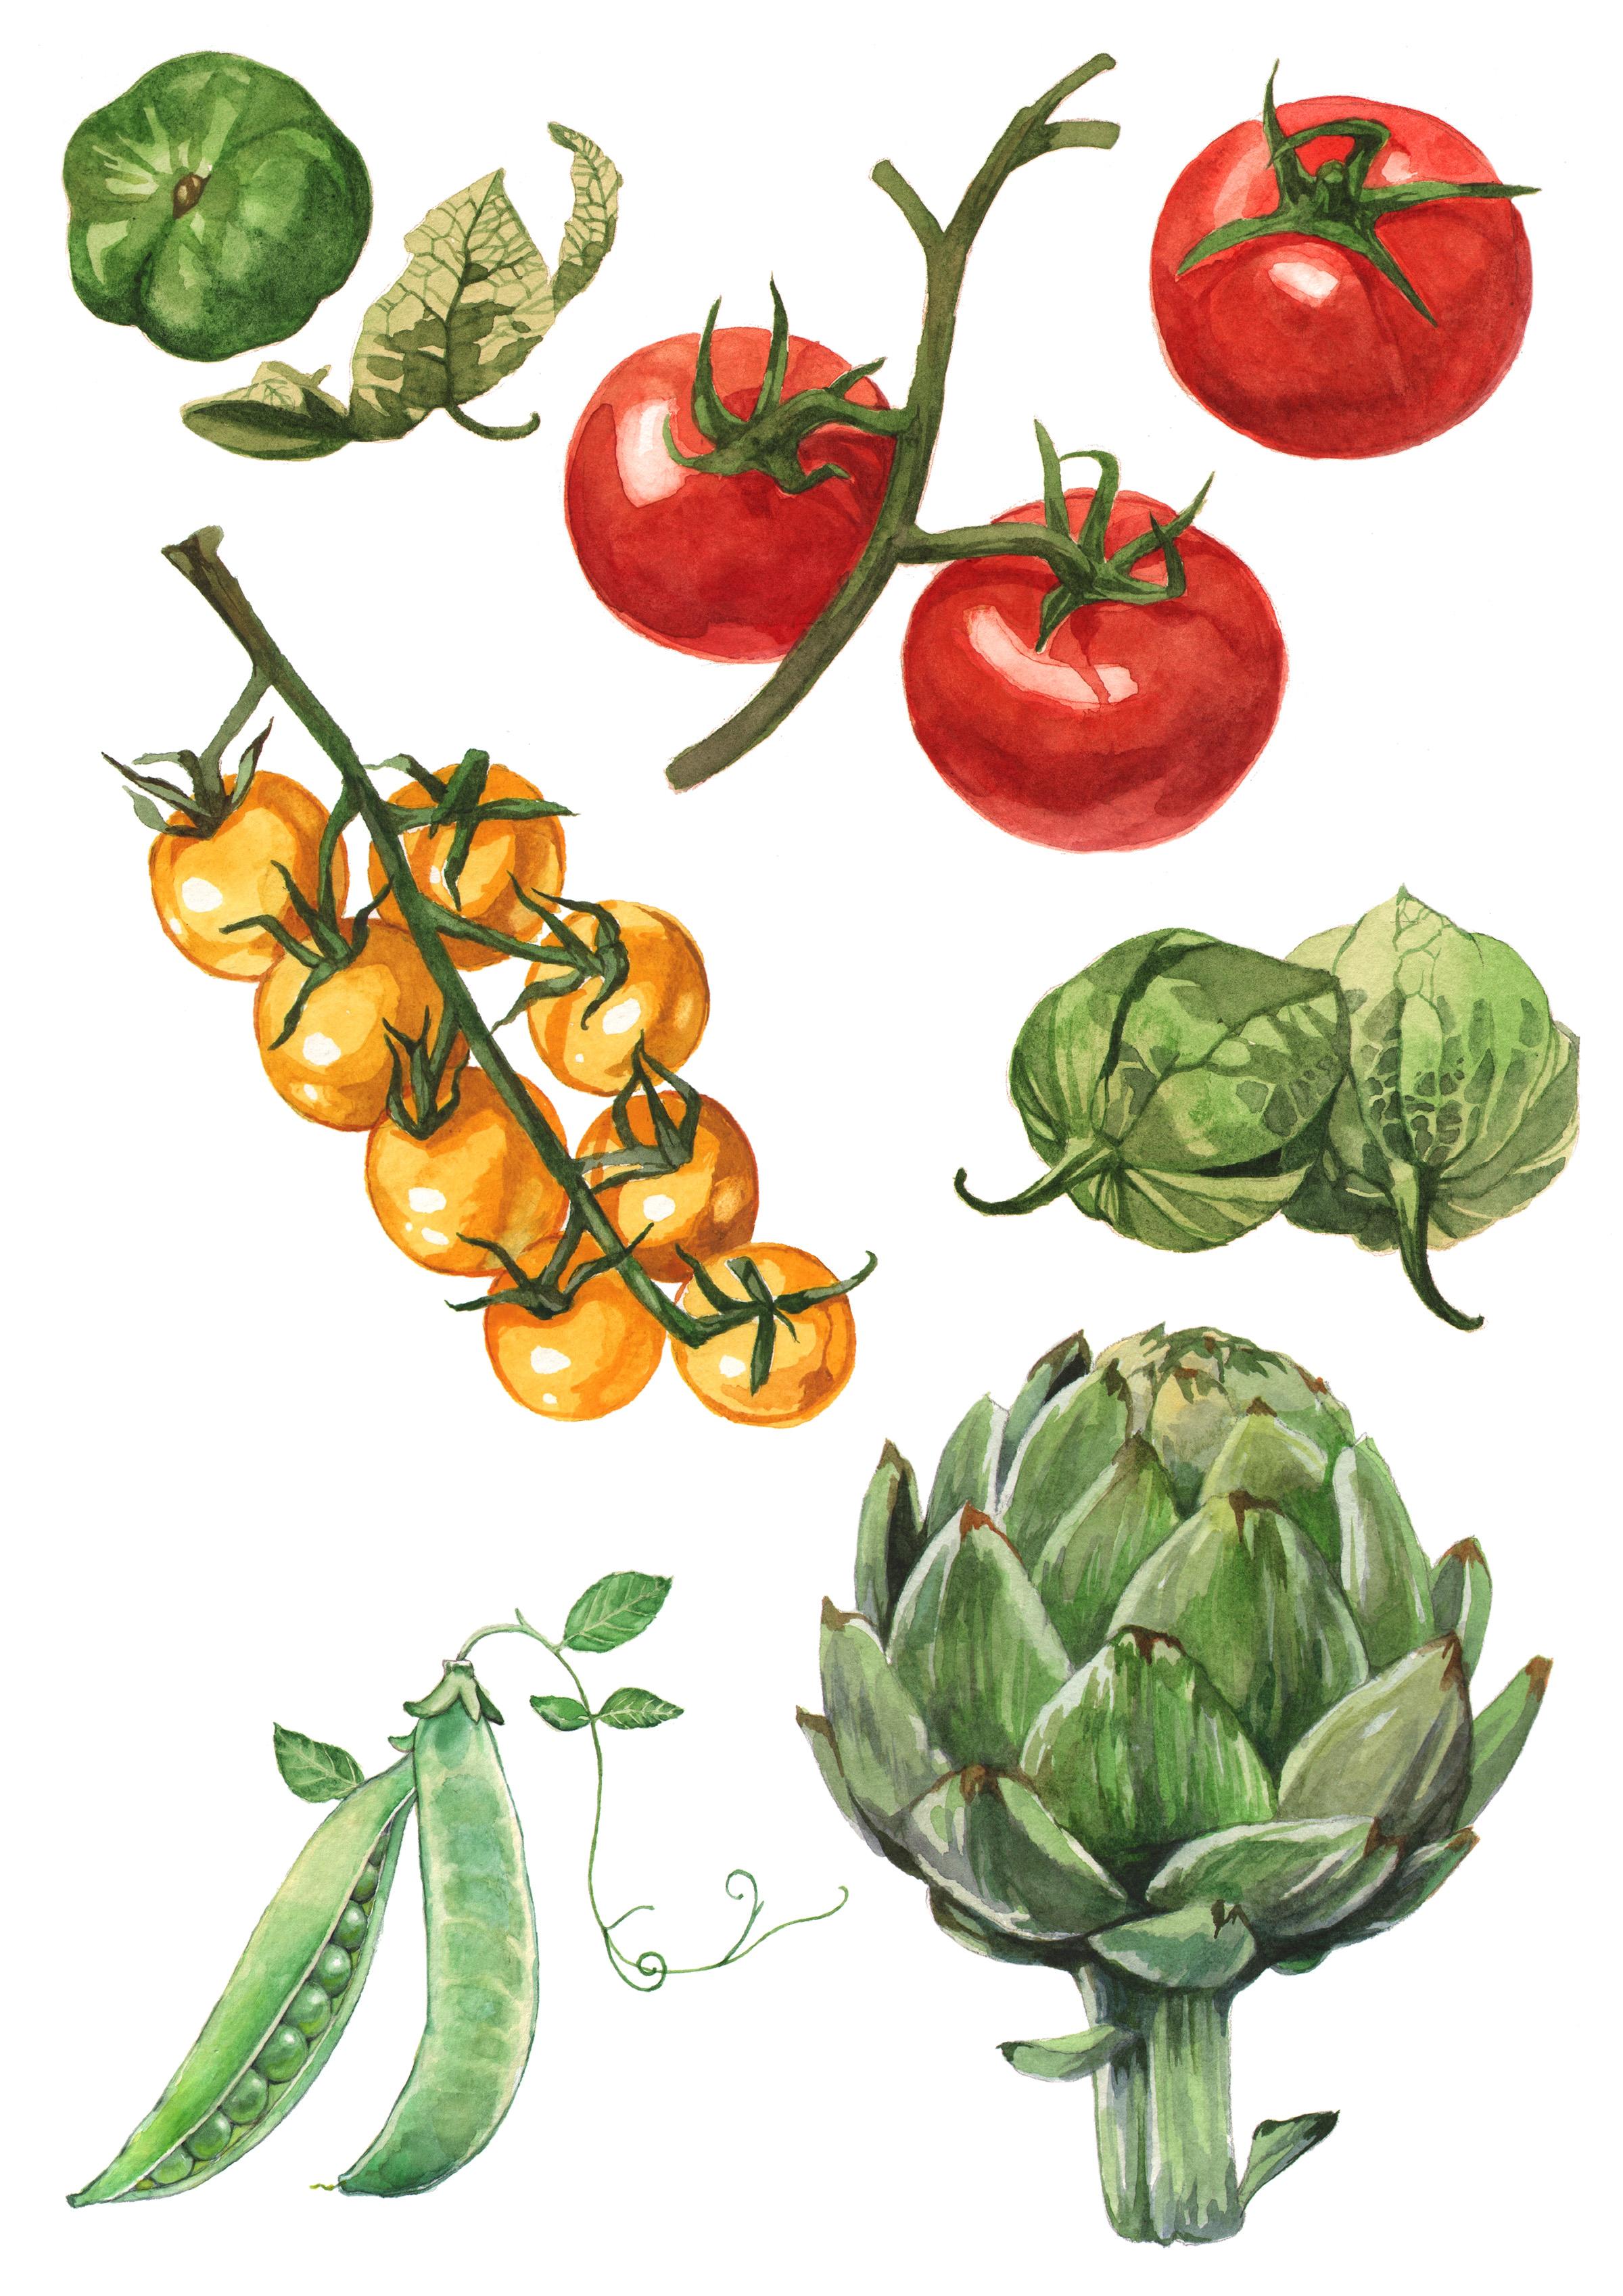 tomatos-artichoke-peas.jpg